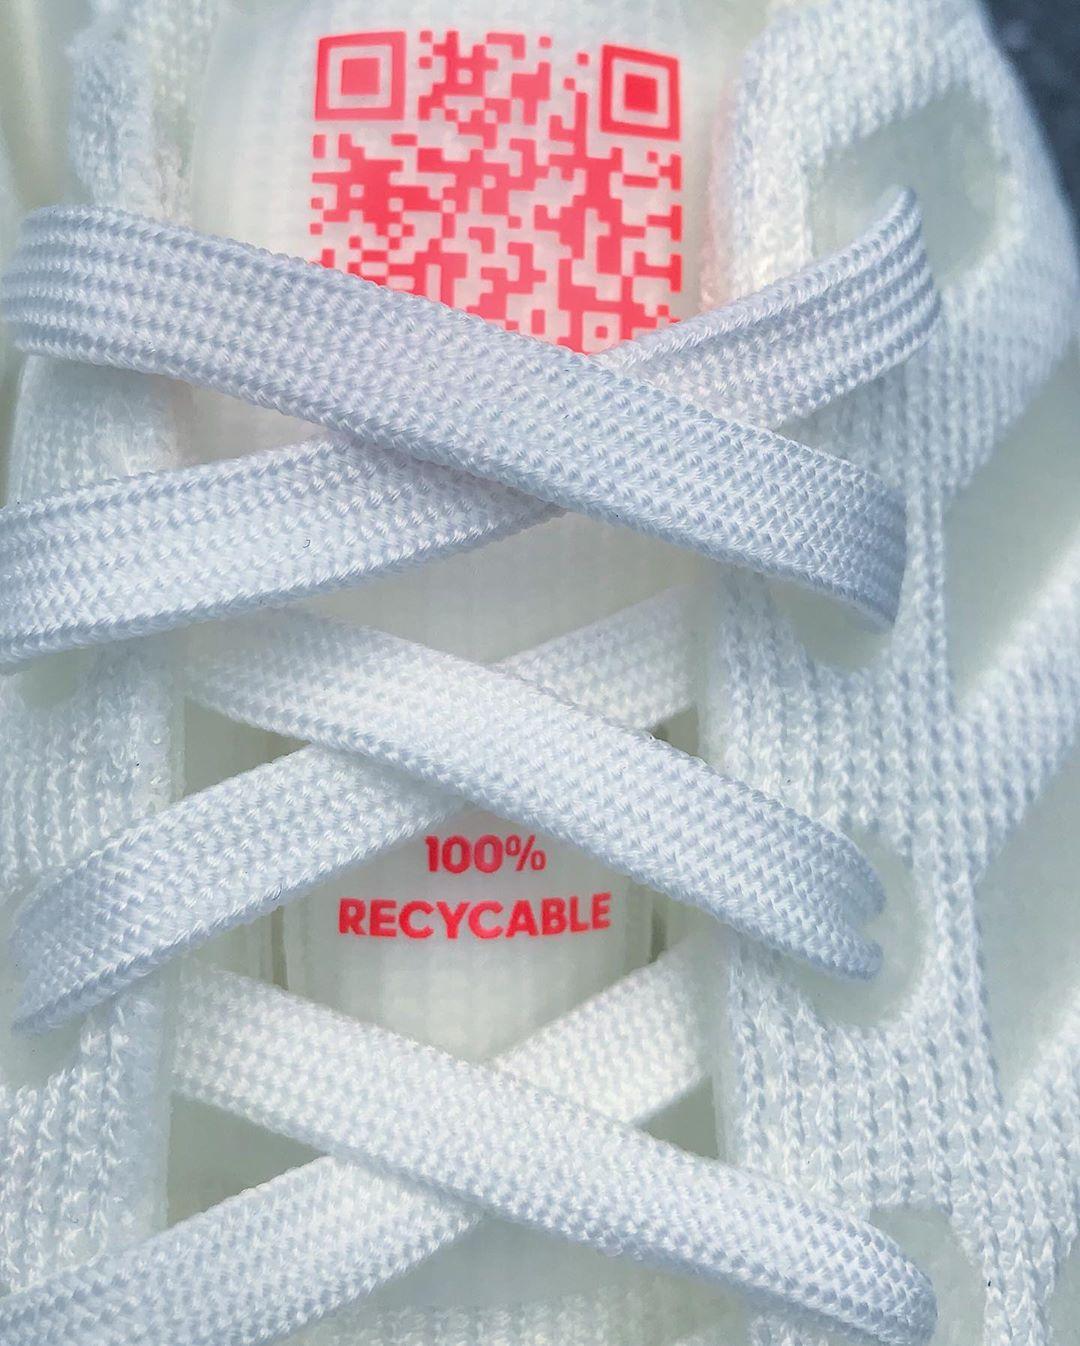 Futurecraft 100Recyclebarer SneakerEverysize Adidas Loop Erster xoedBrCW